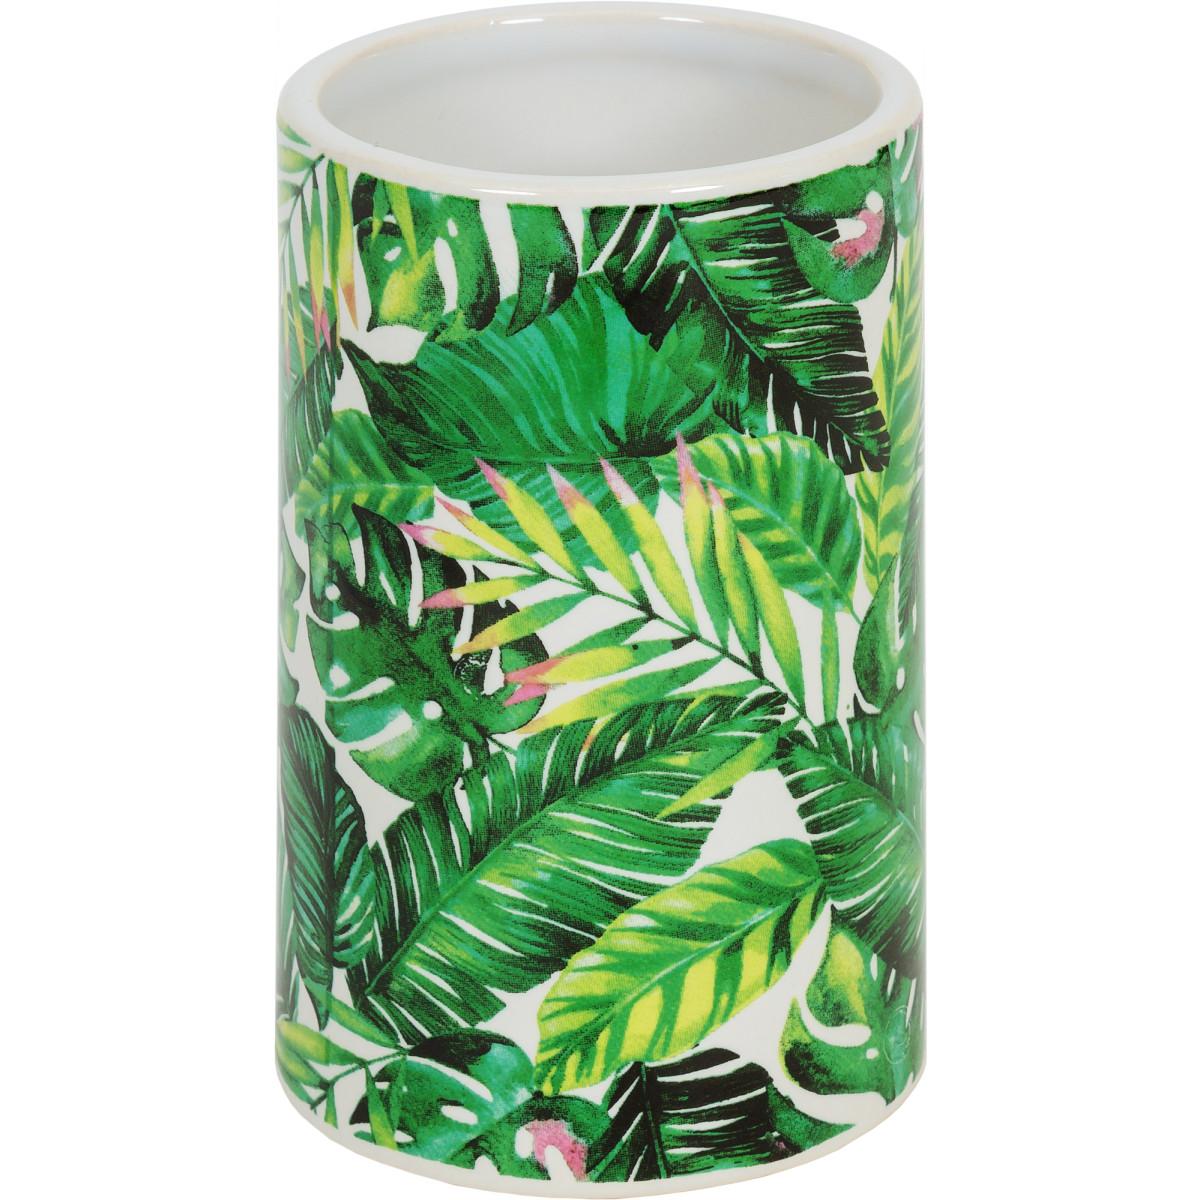 Стакан для зубных щеток Tropic керамика цвет зеленый